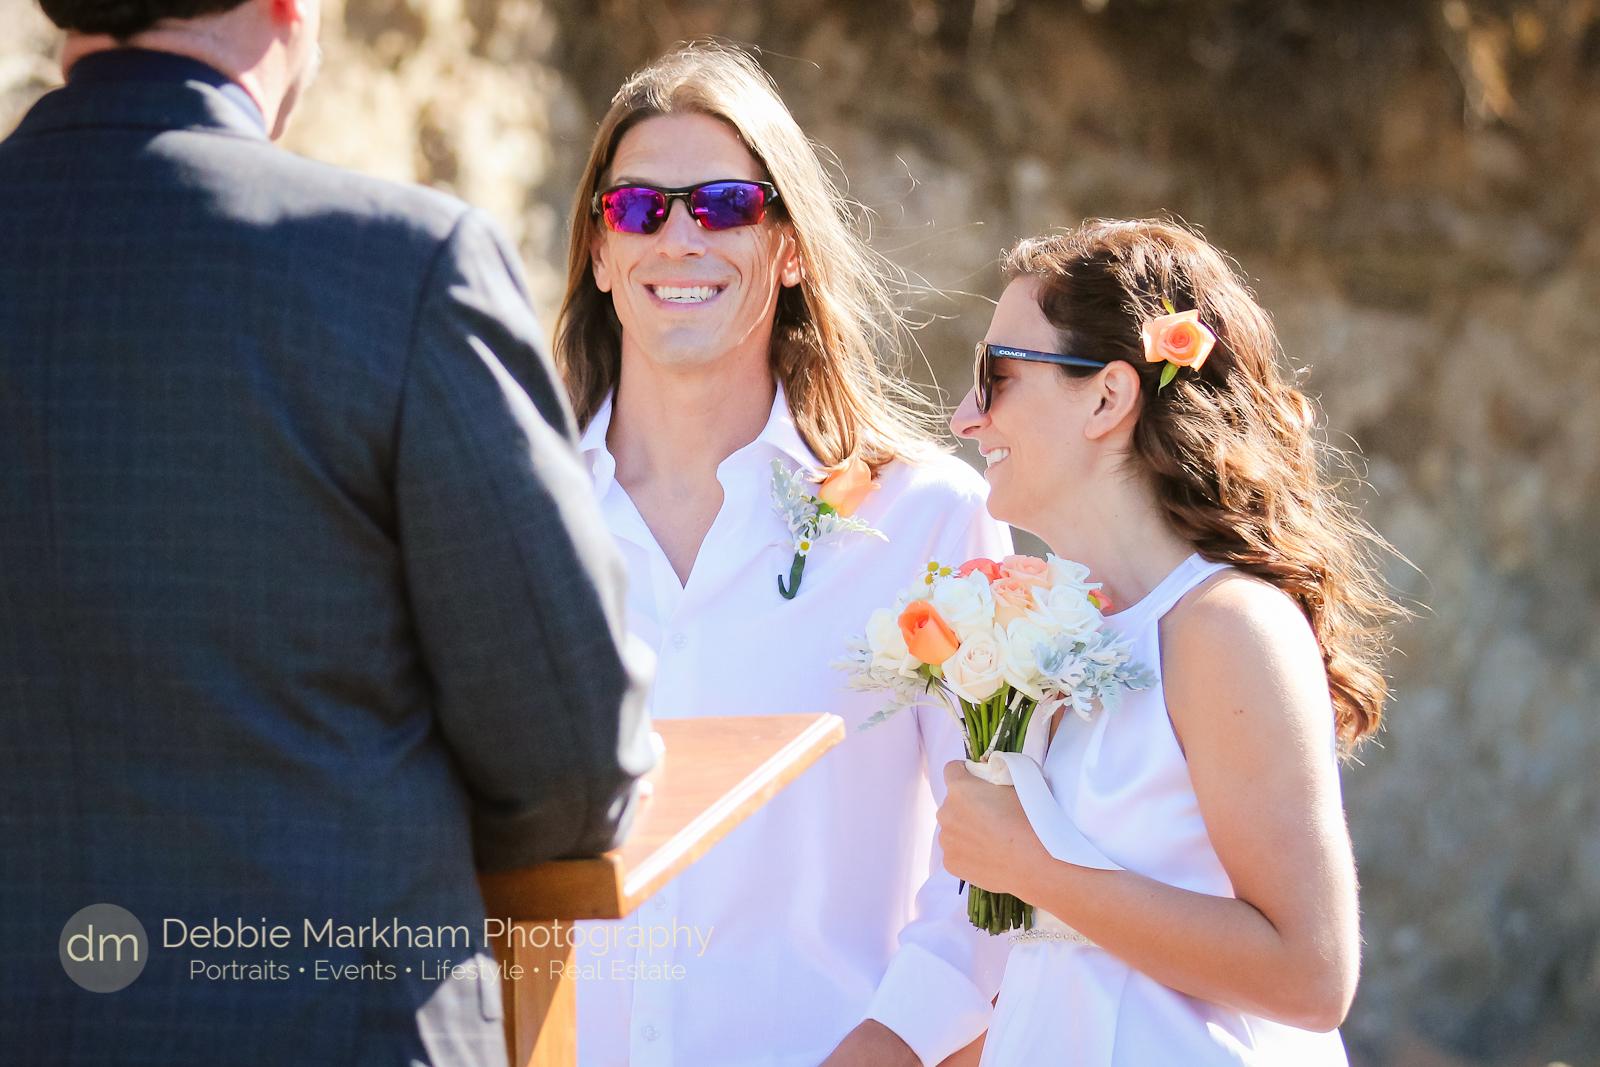 Debbie Markham Photography_Intimate Wedding_ Moonstone Beach_Wedding Photographer_Cambria_CA_Destination Wedding_Elopement-9366